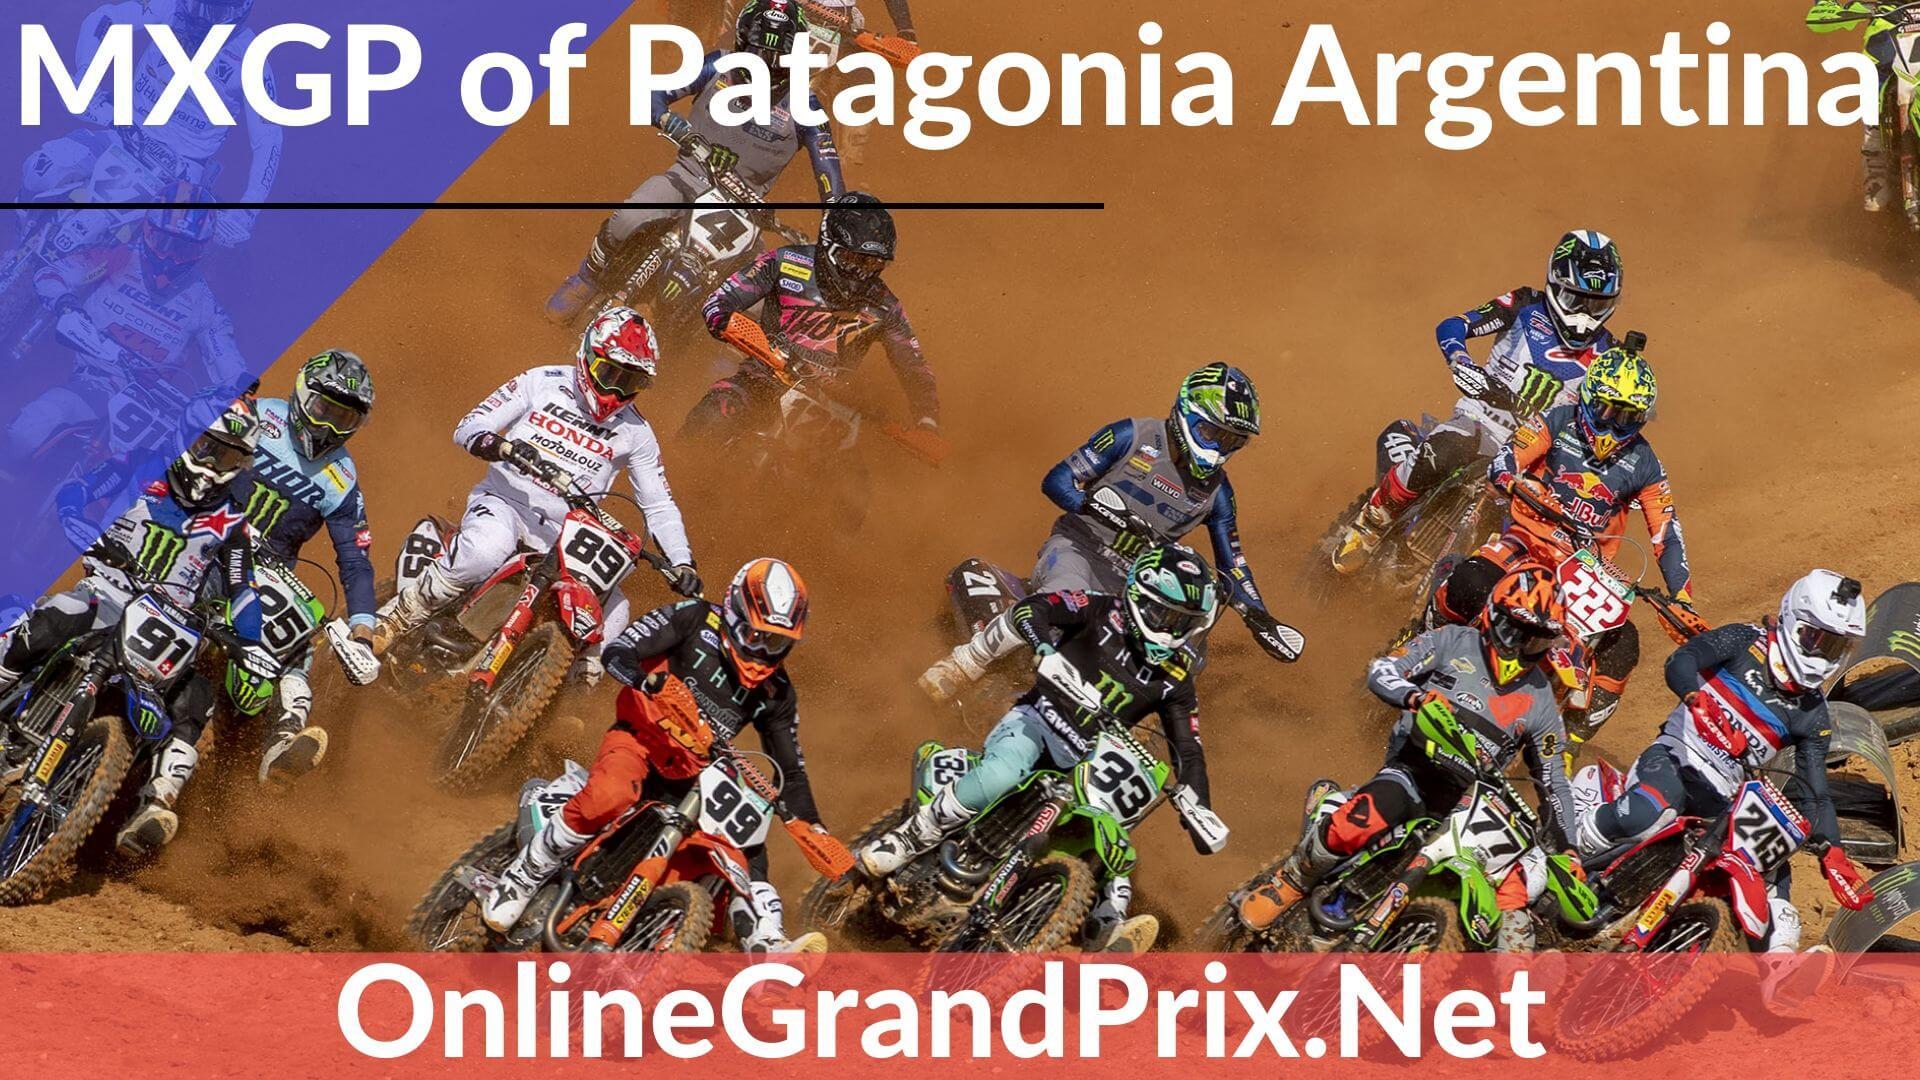 Patagonia Argentina MXGP Live Stream 2020 | FIM MotoCross WC